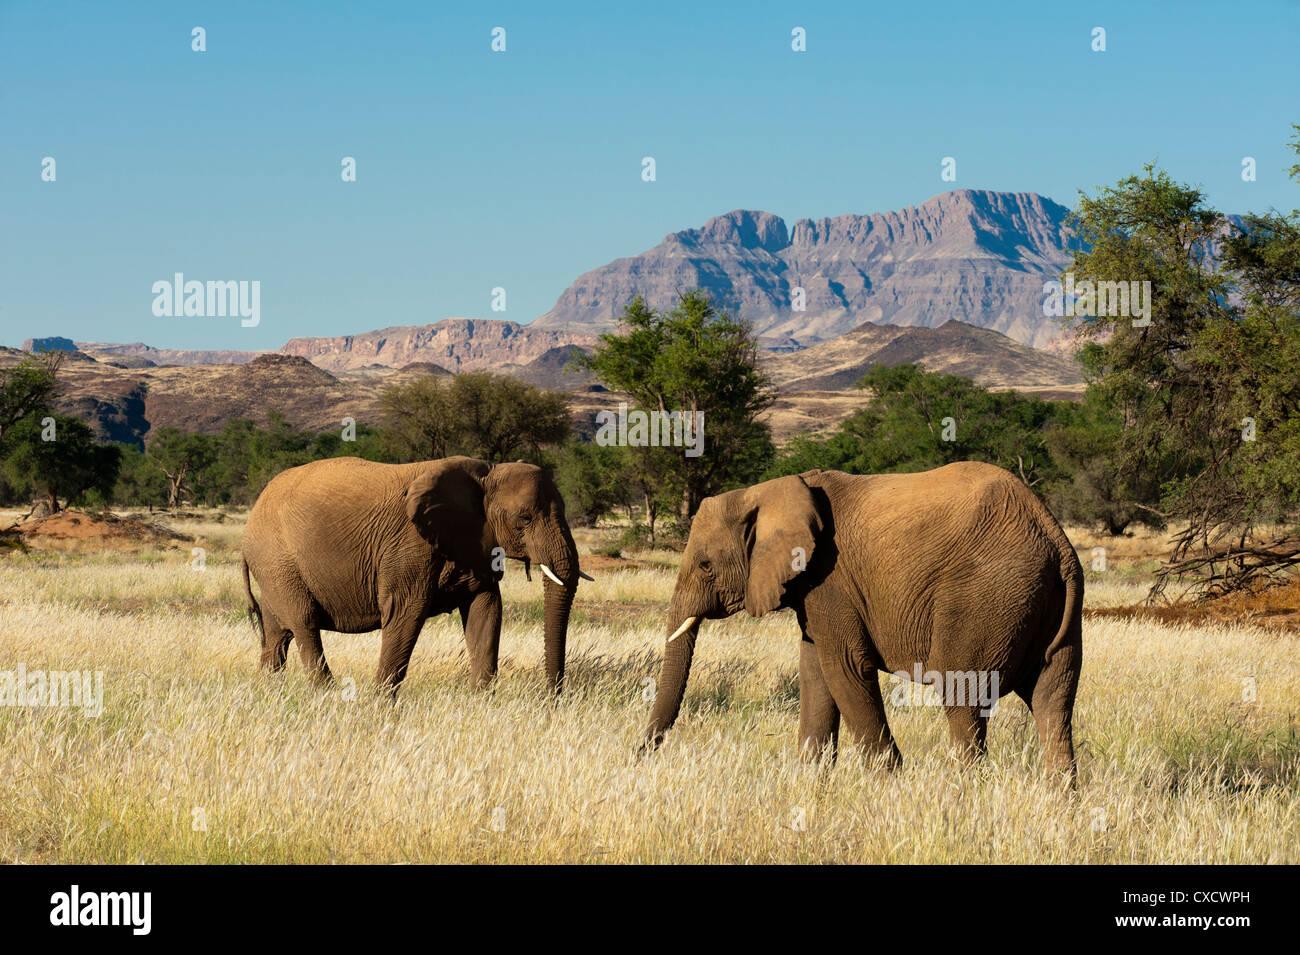 Desert elephants (Loxodonta africana), Huab River Valley, Torra Conservancy, Damaraland, Namibia, Africa - Stock Image